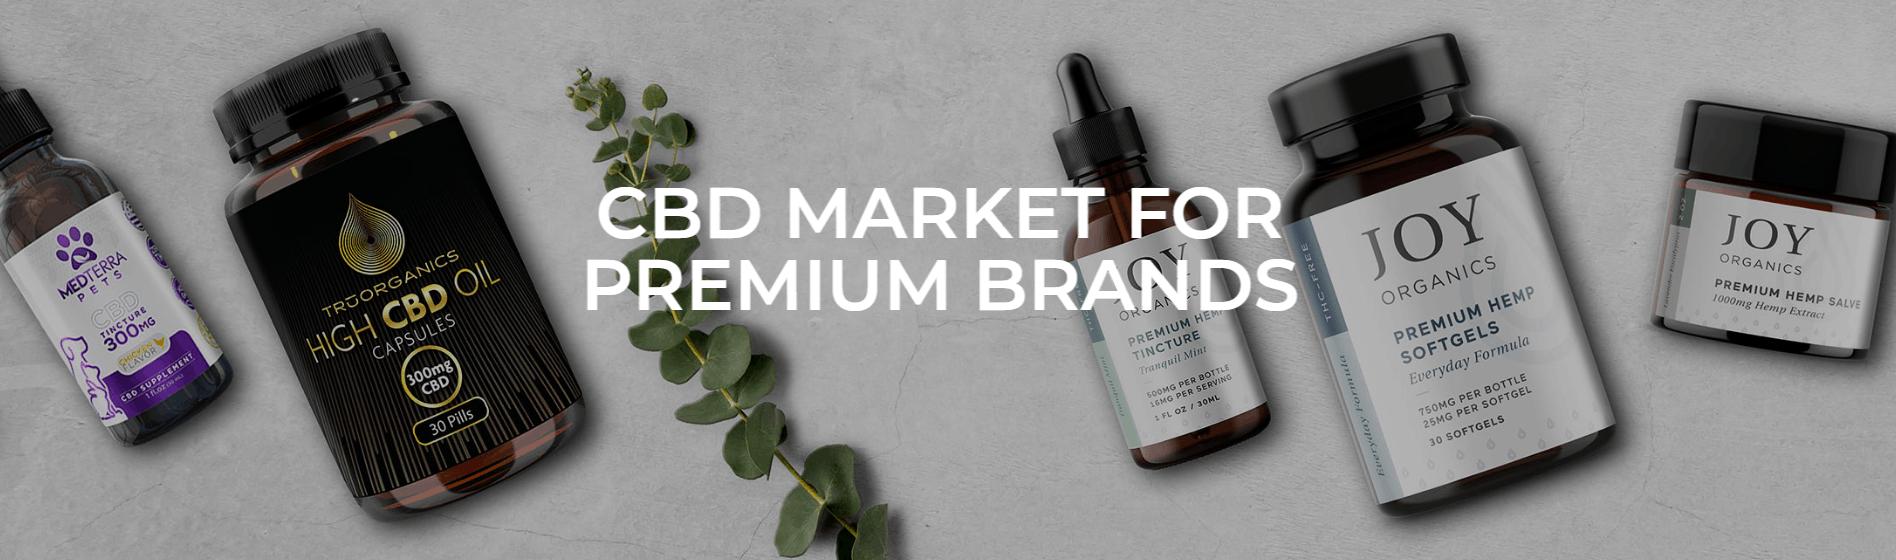 All Premium CBD Coupon Code Brands